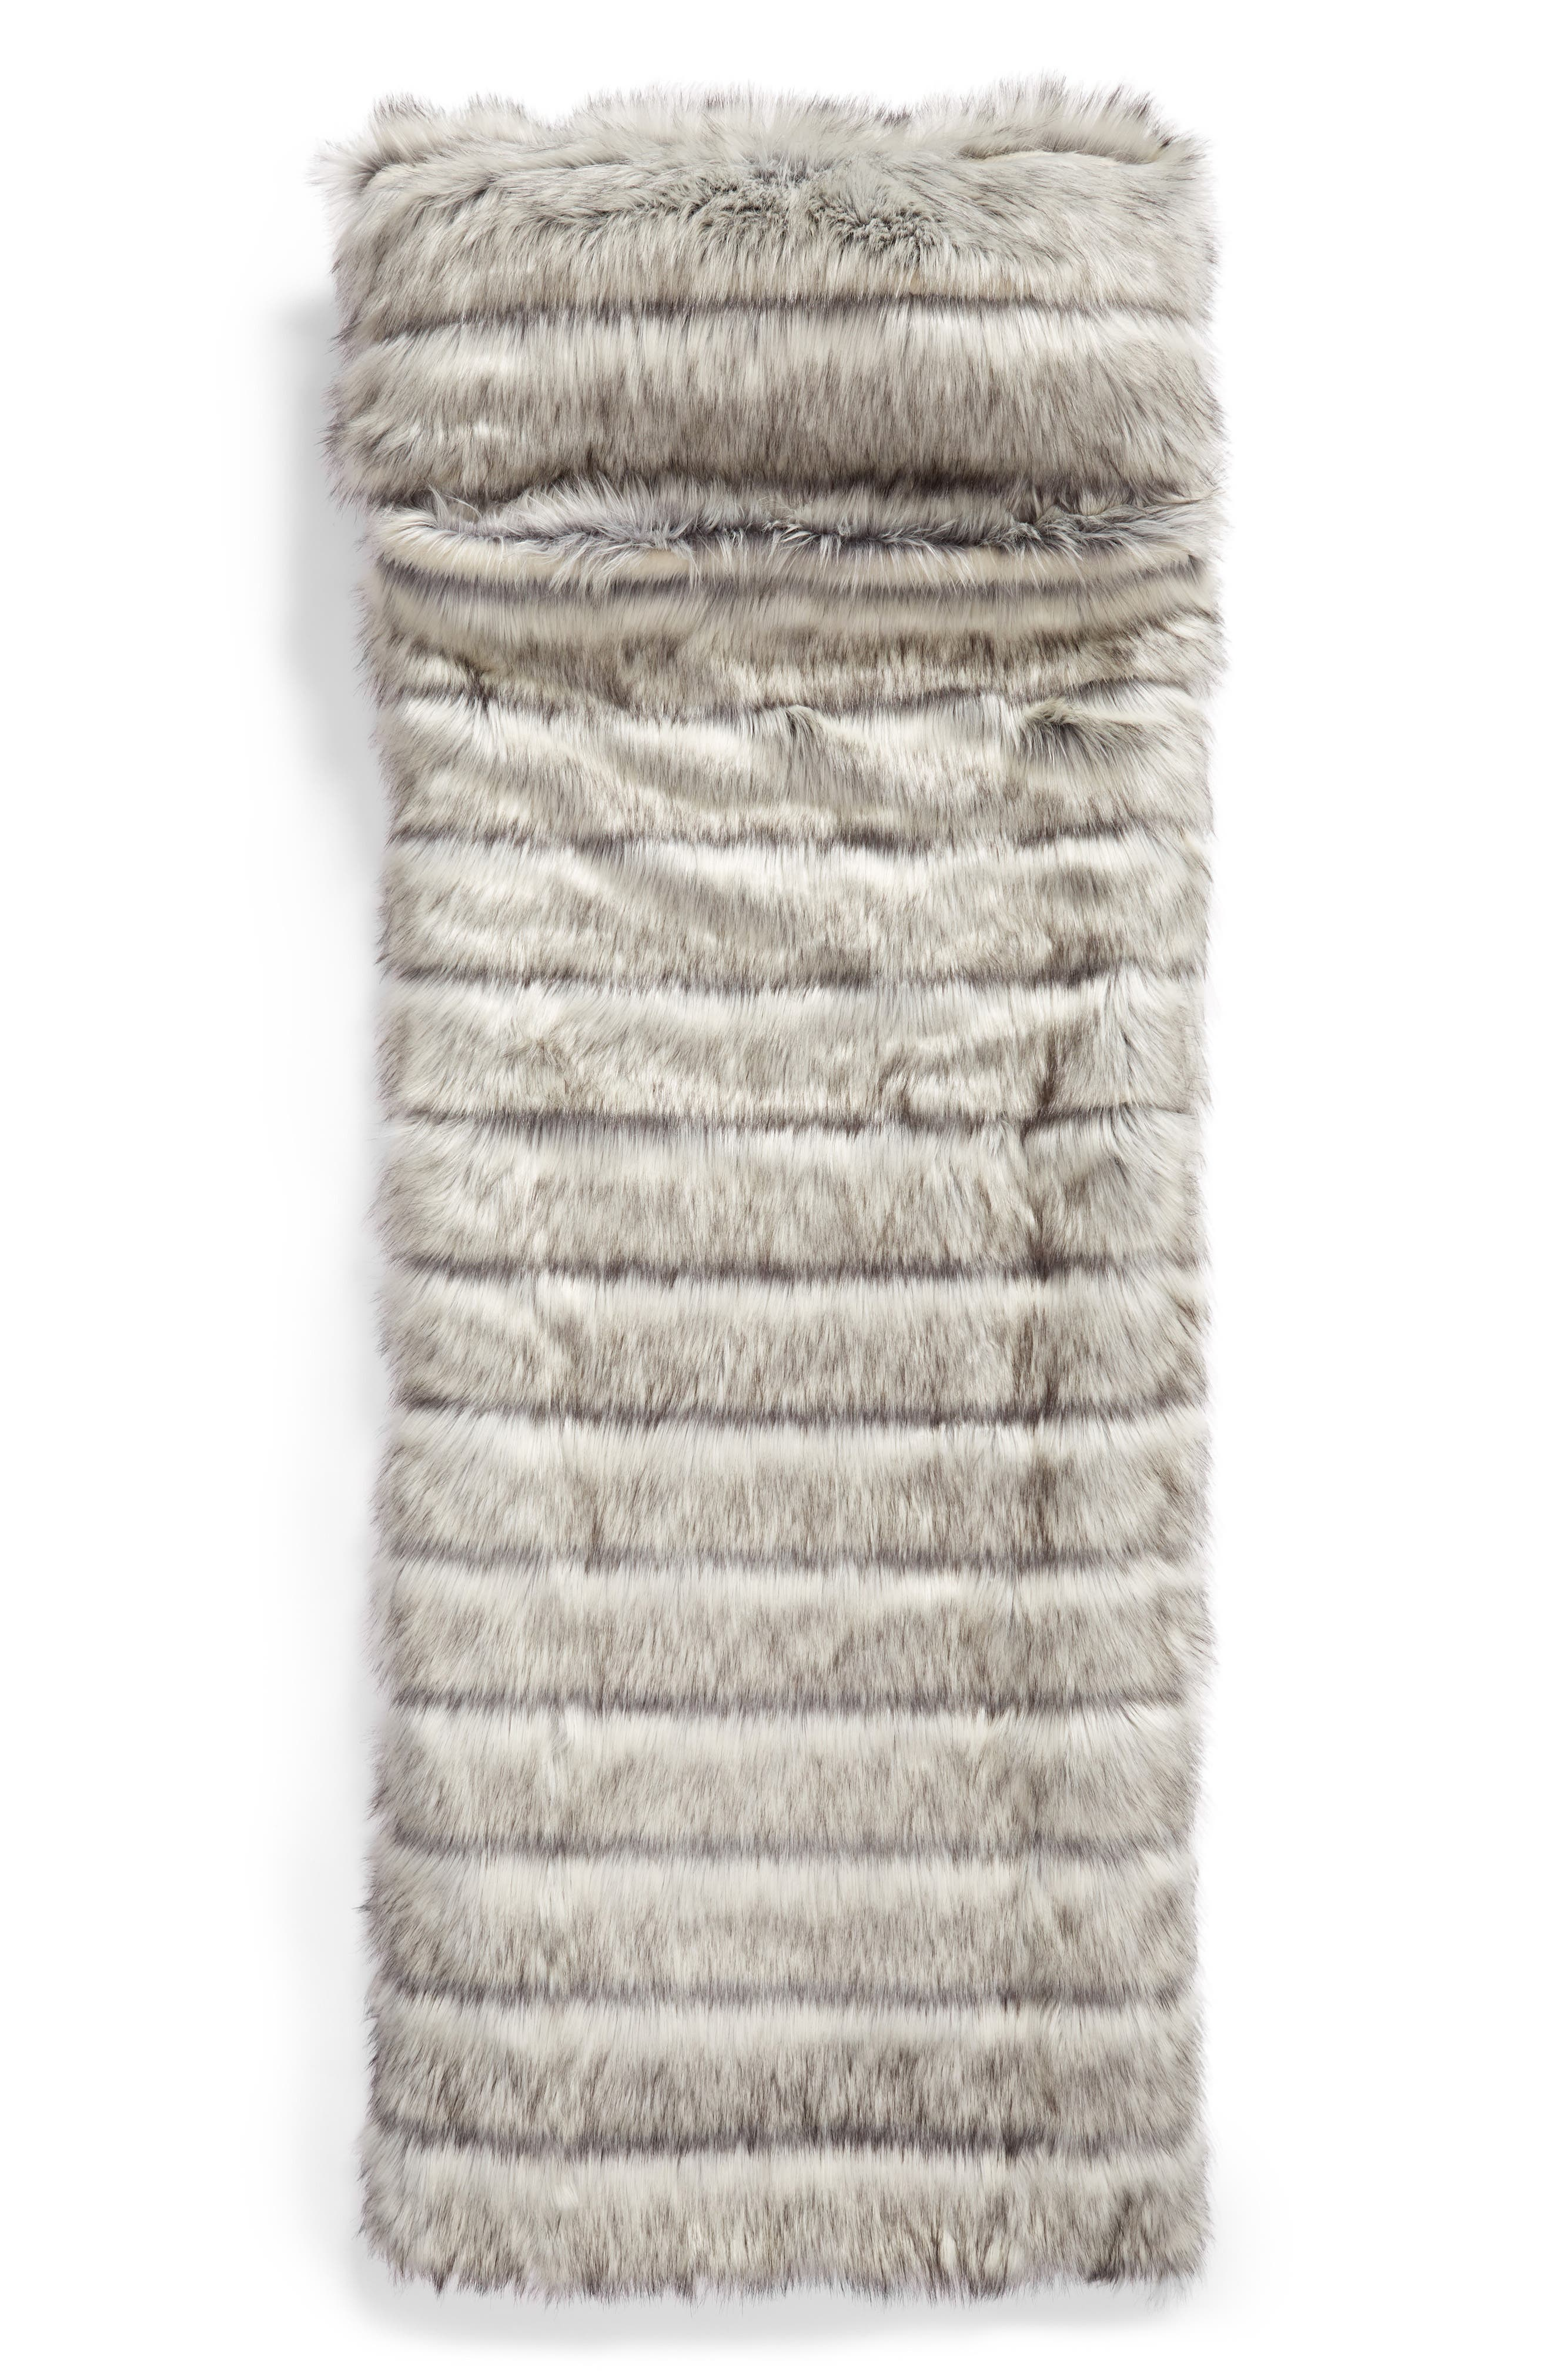 Luxe Faux Fur Slumber Bag,                             Main thumbnail 1, color,                             GREY FROST MULTI